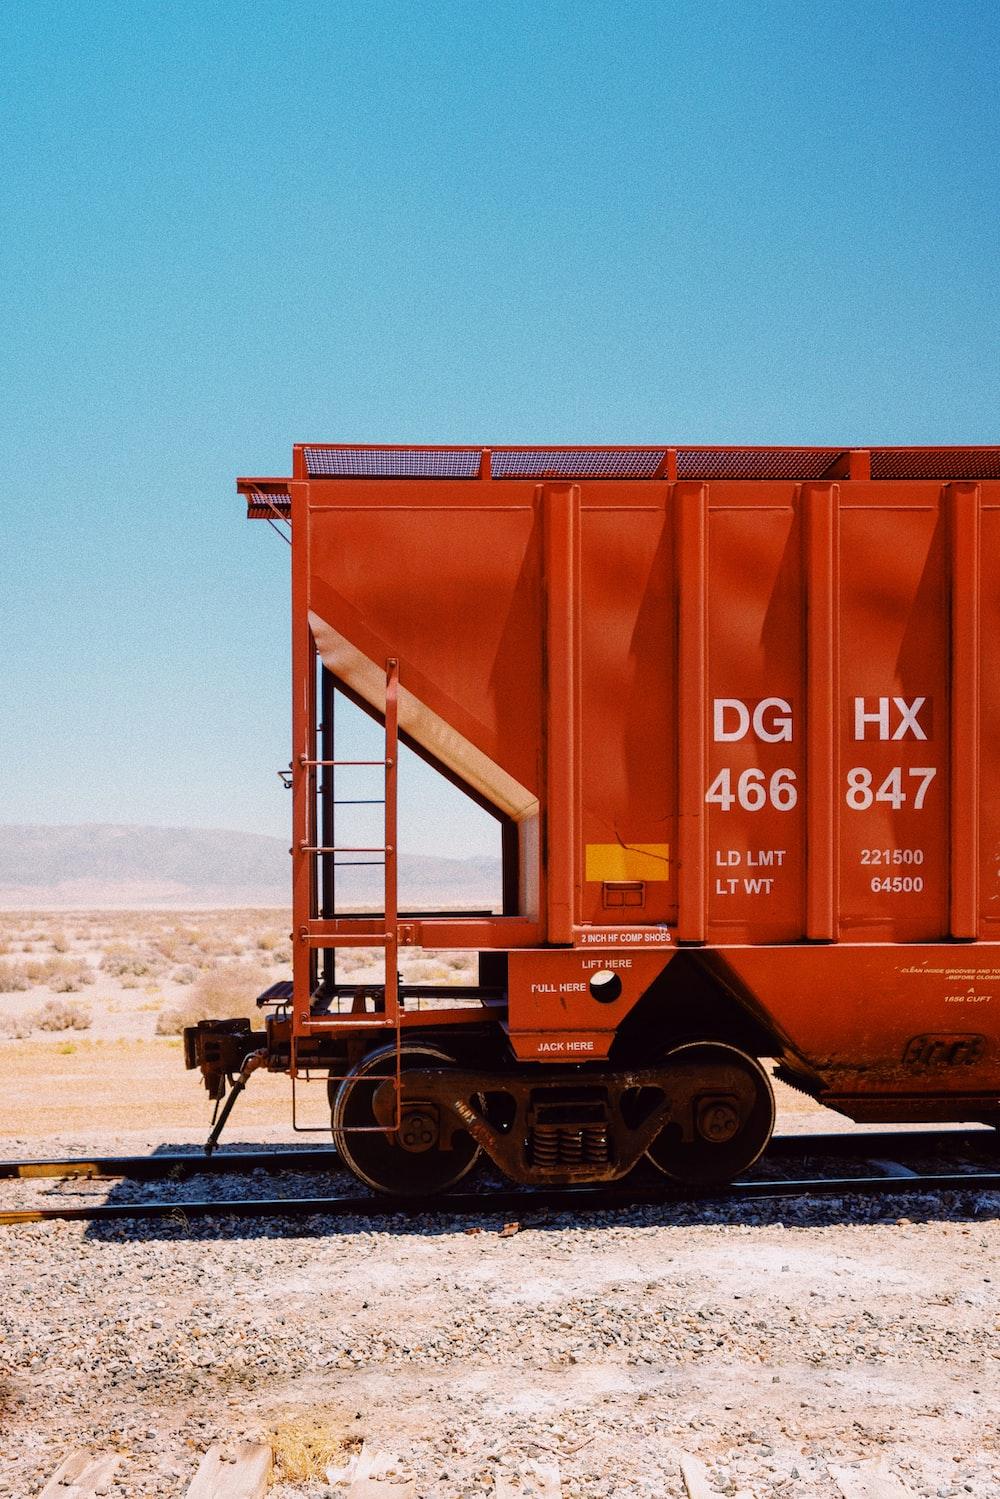 brown metal train on rail tracks during daytime